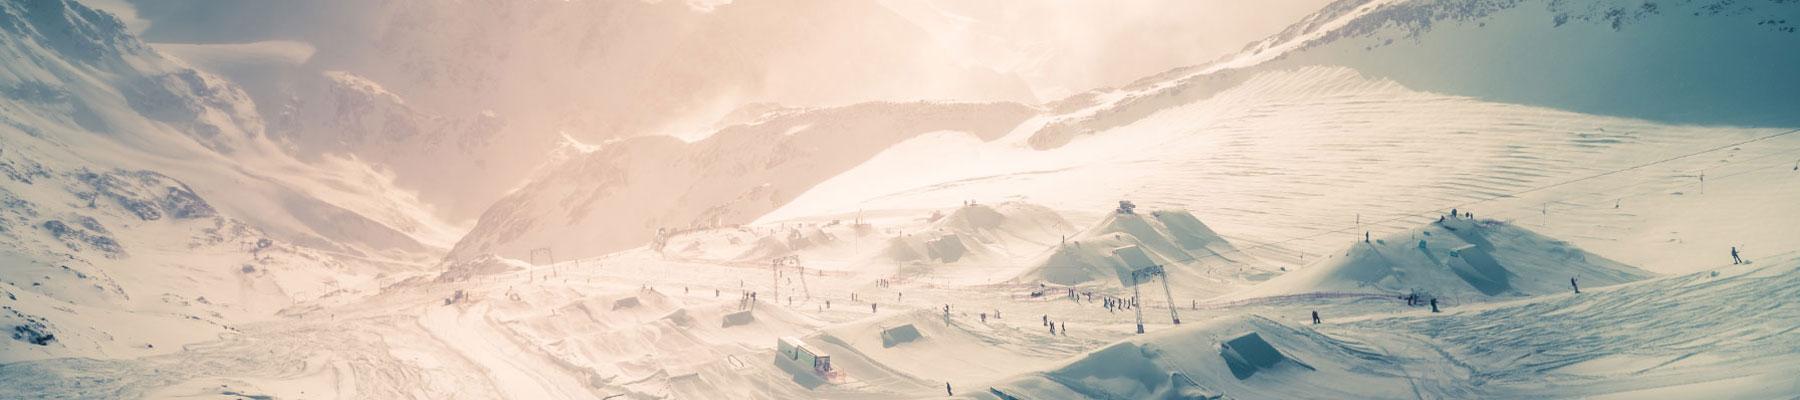 Kulkea Skiing Products - Ski Slope